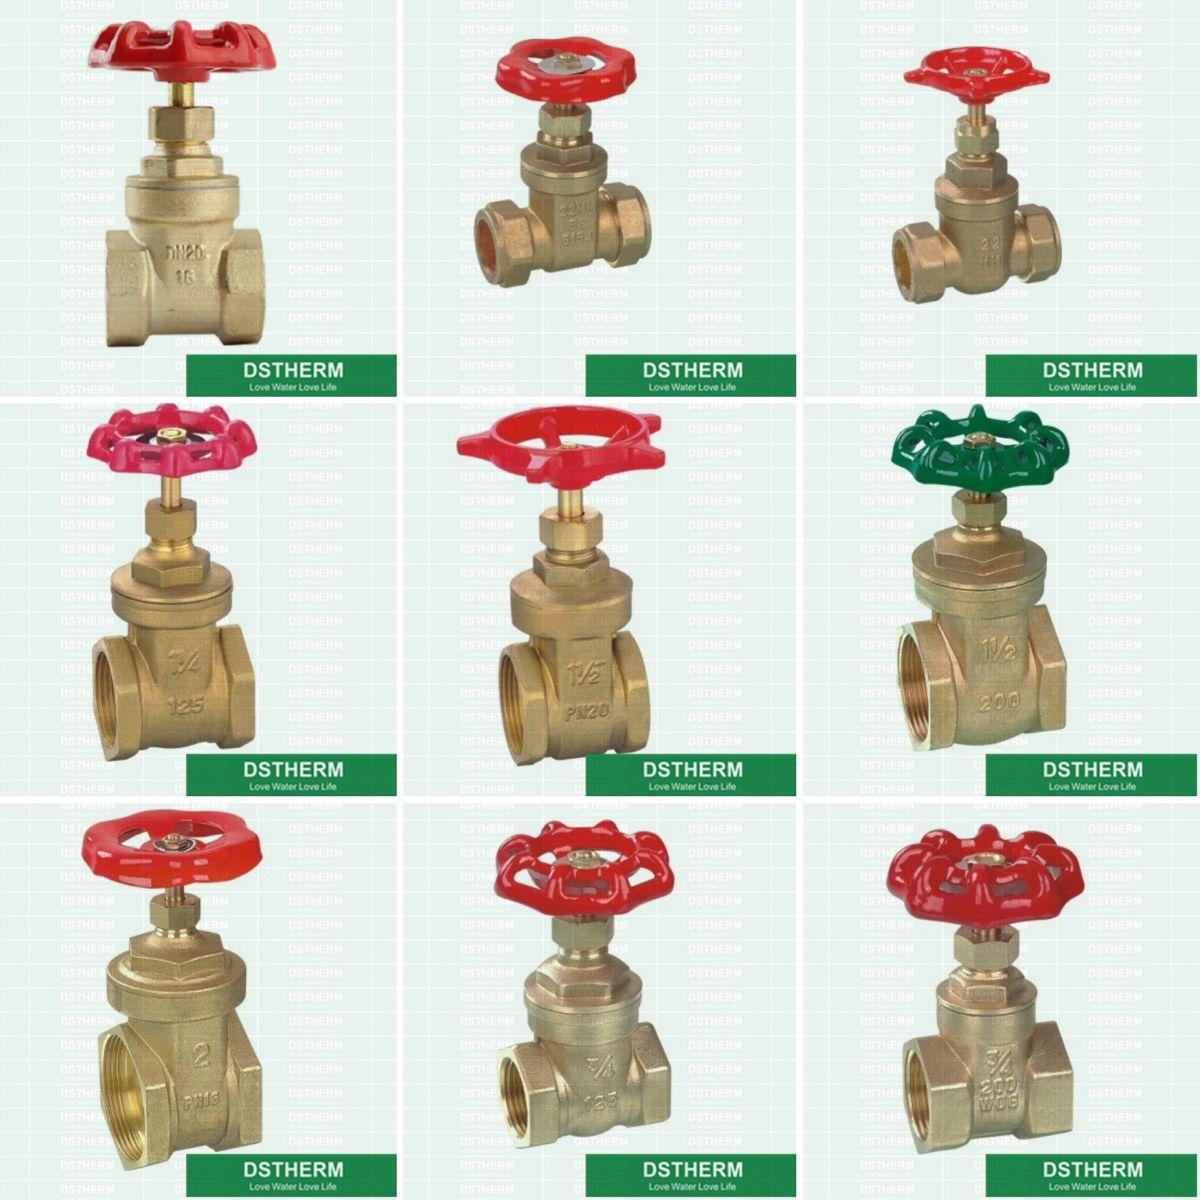 Material common brass cw617n dzr cw602n cz132 etc